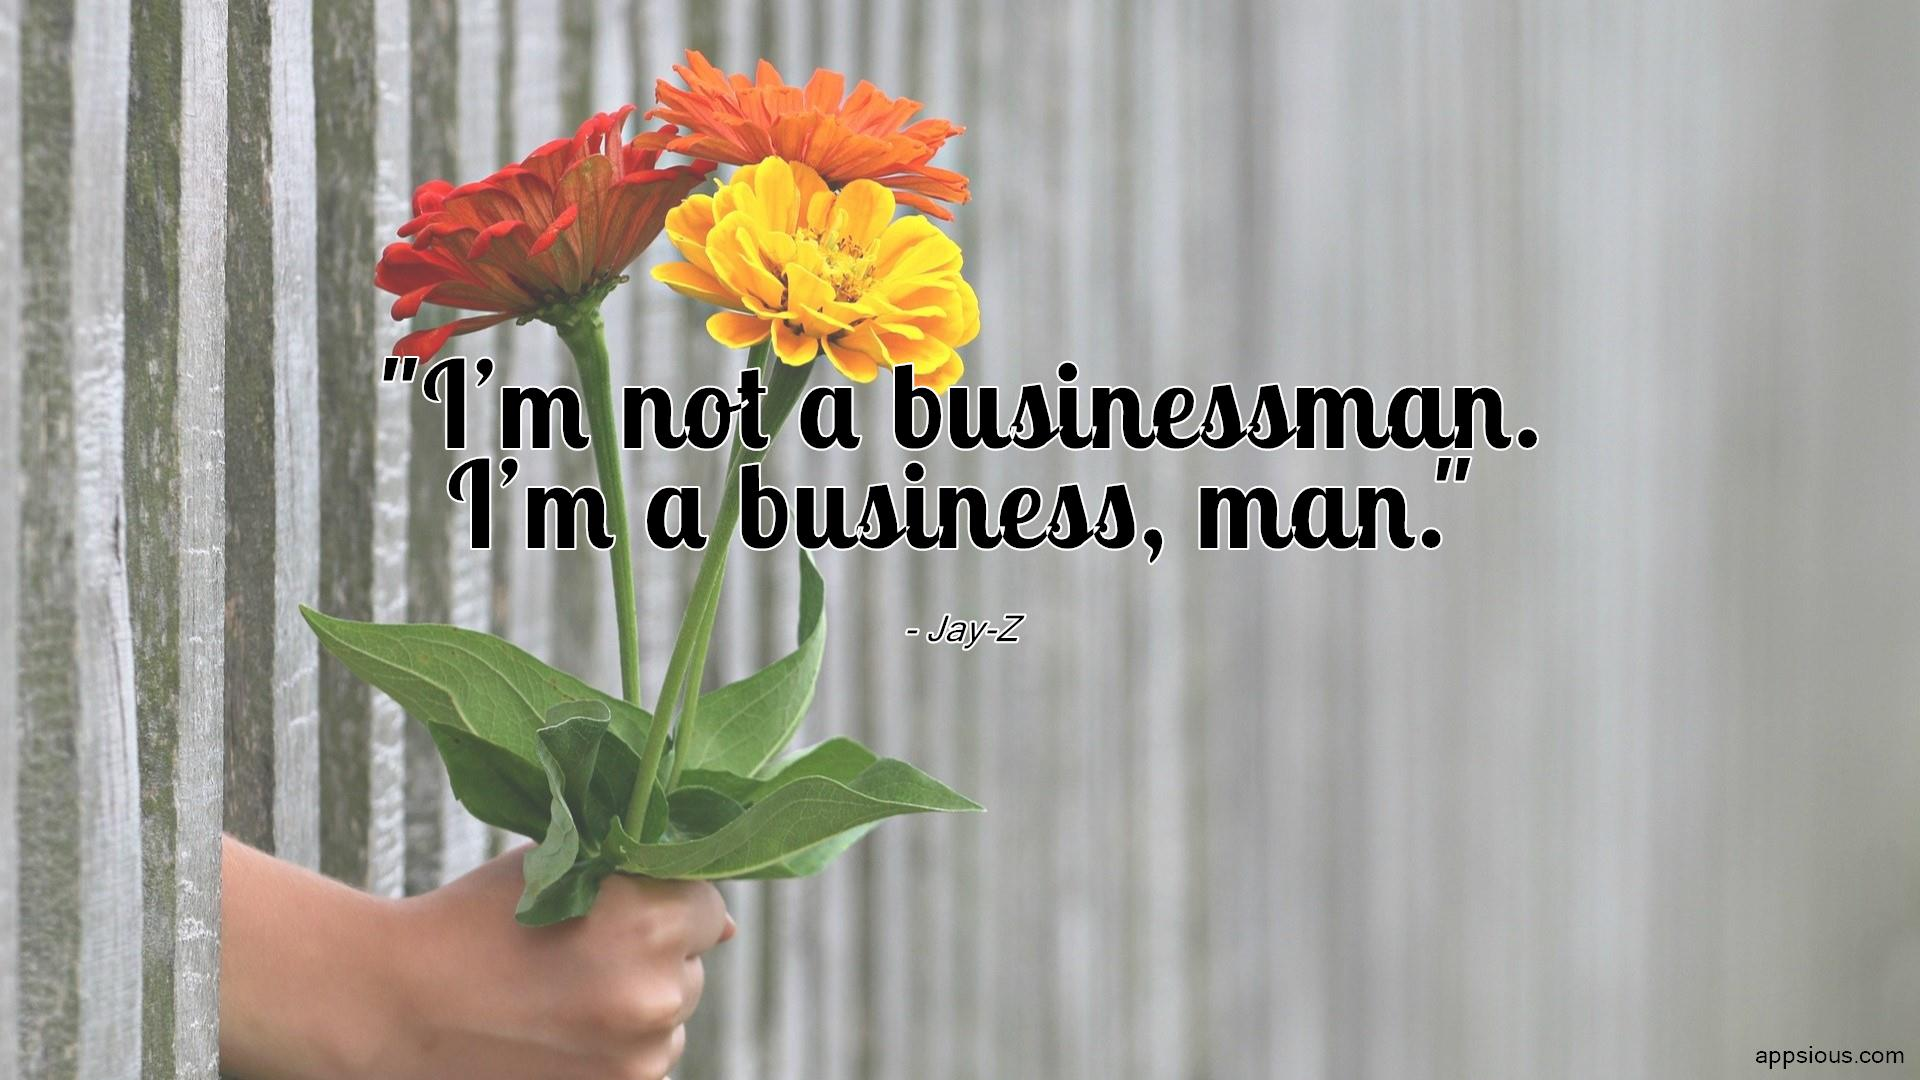 I'm not a businessman. I'm a business, man.